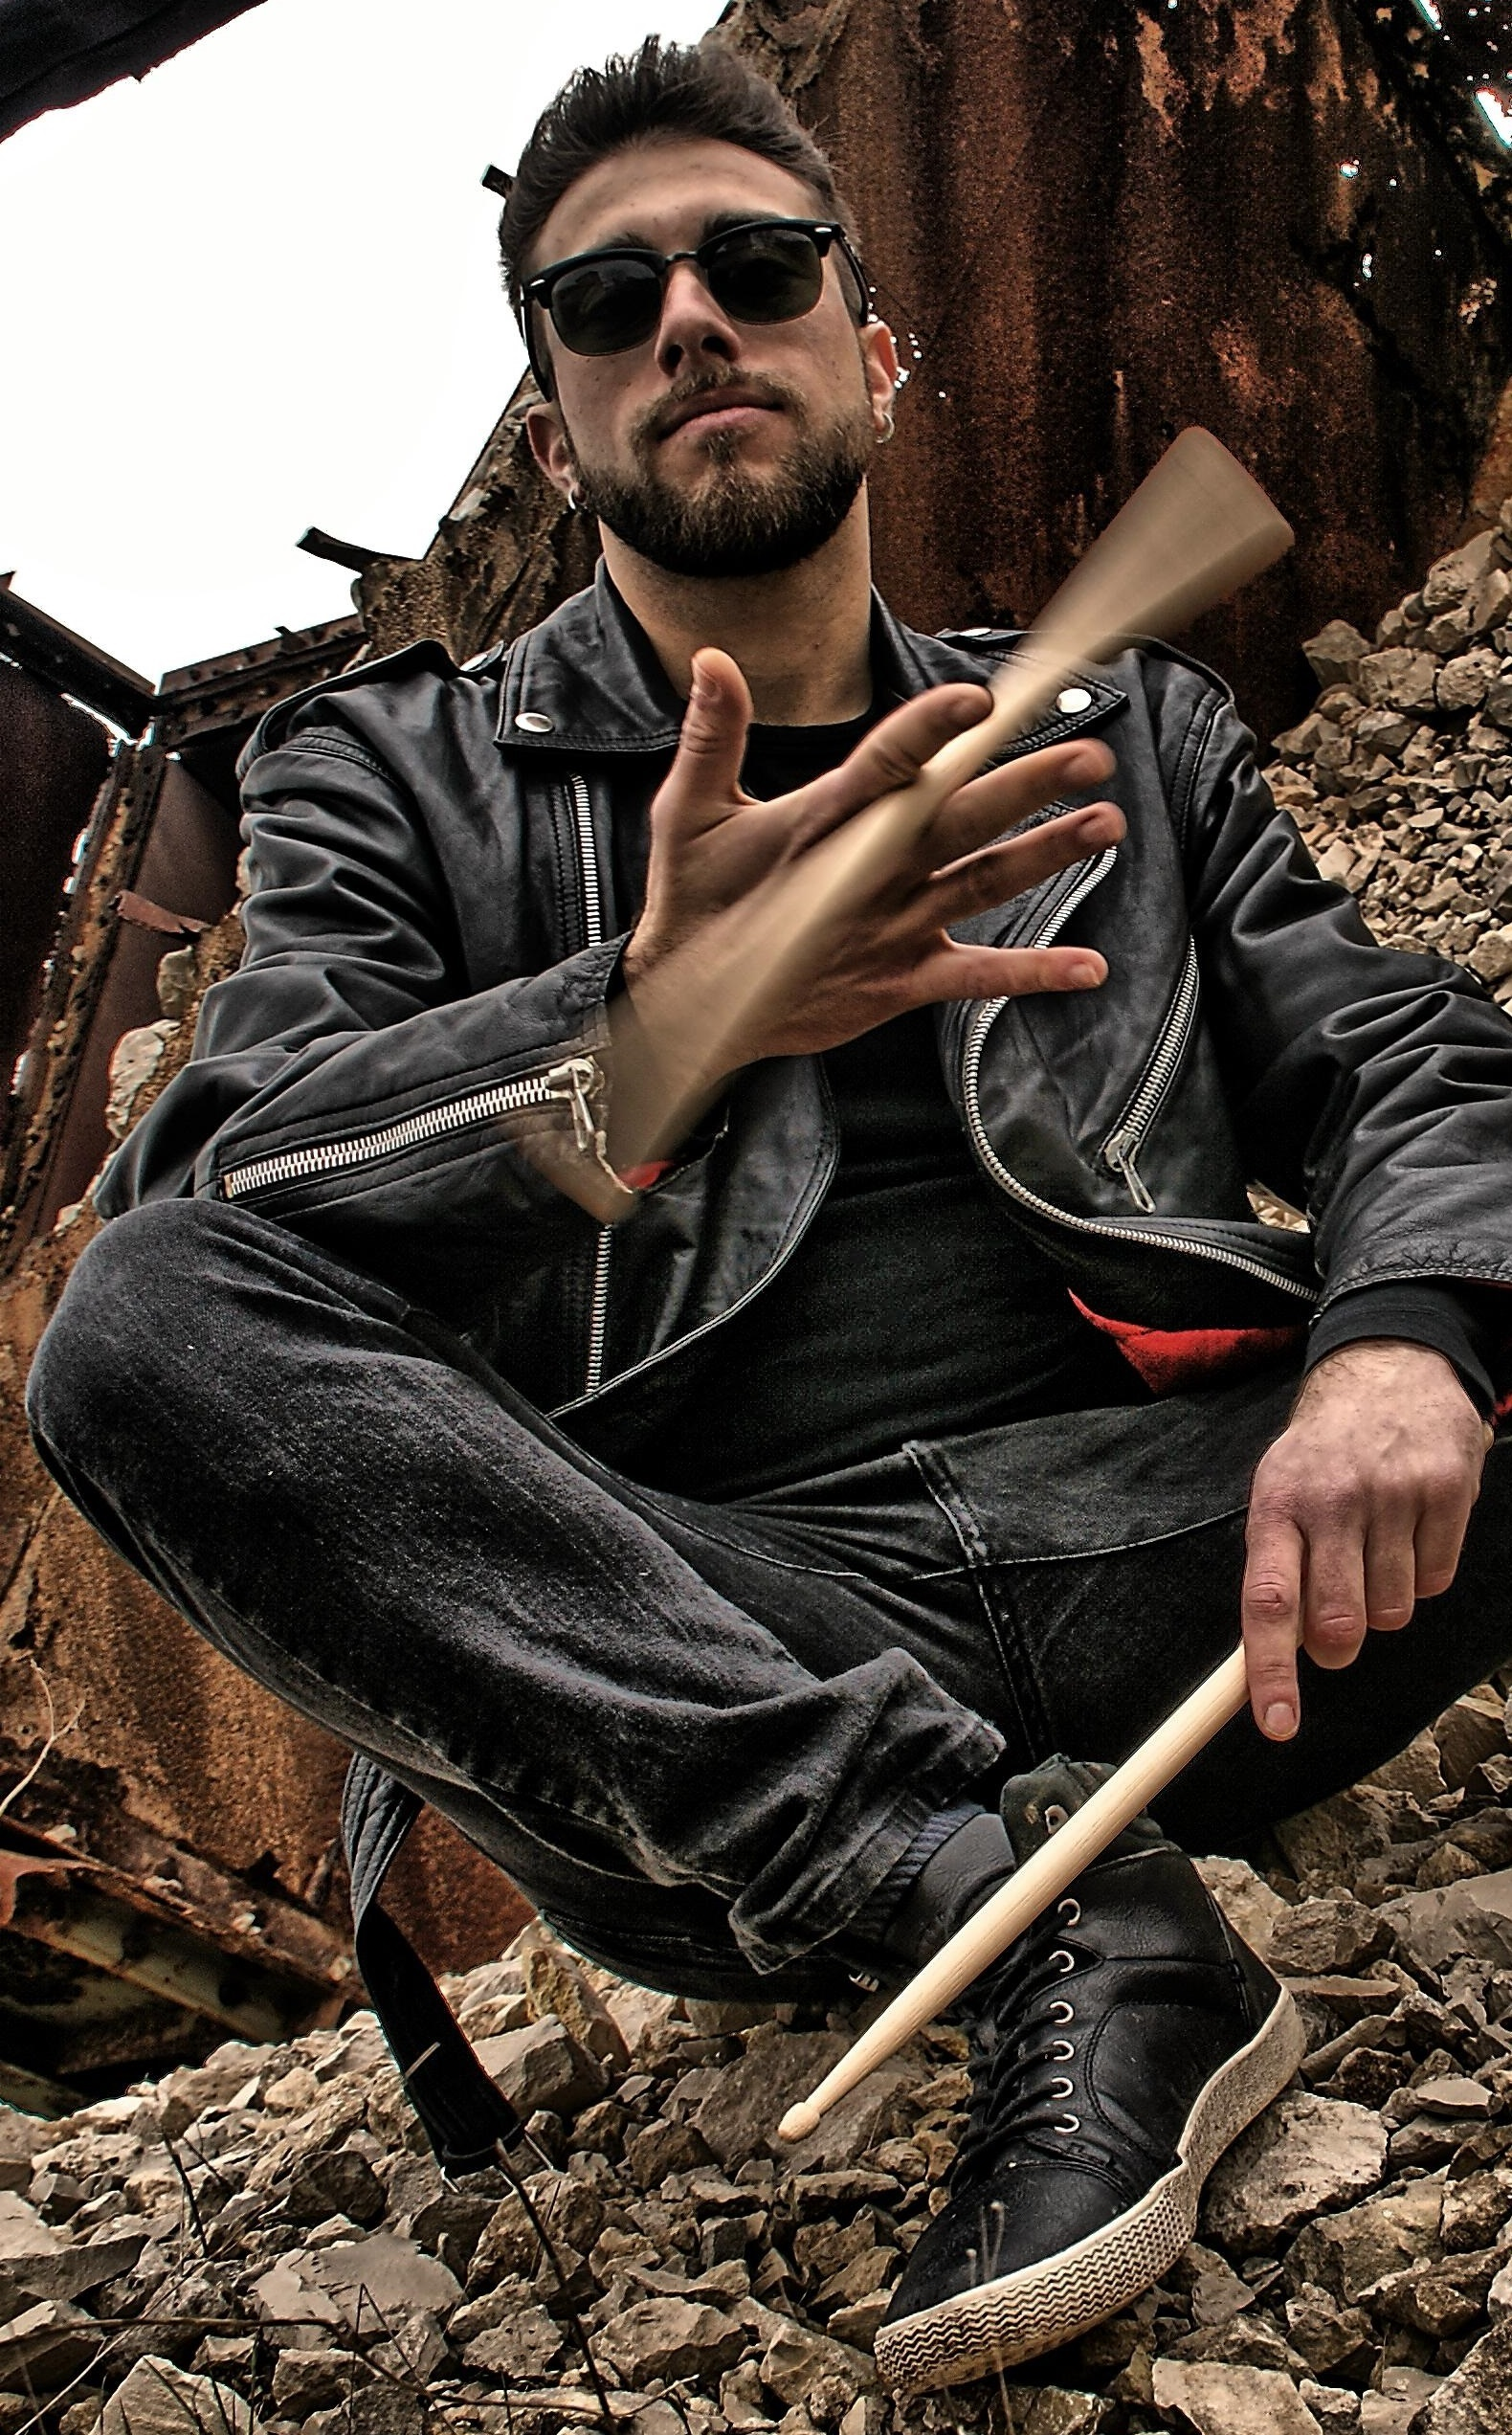 Alessandro Scorrano - Drums